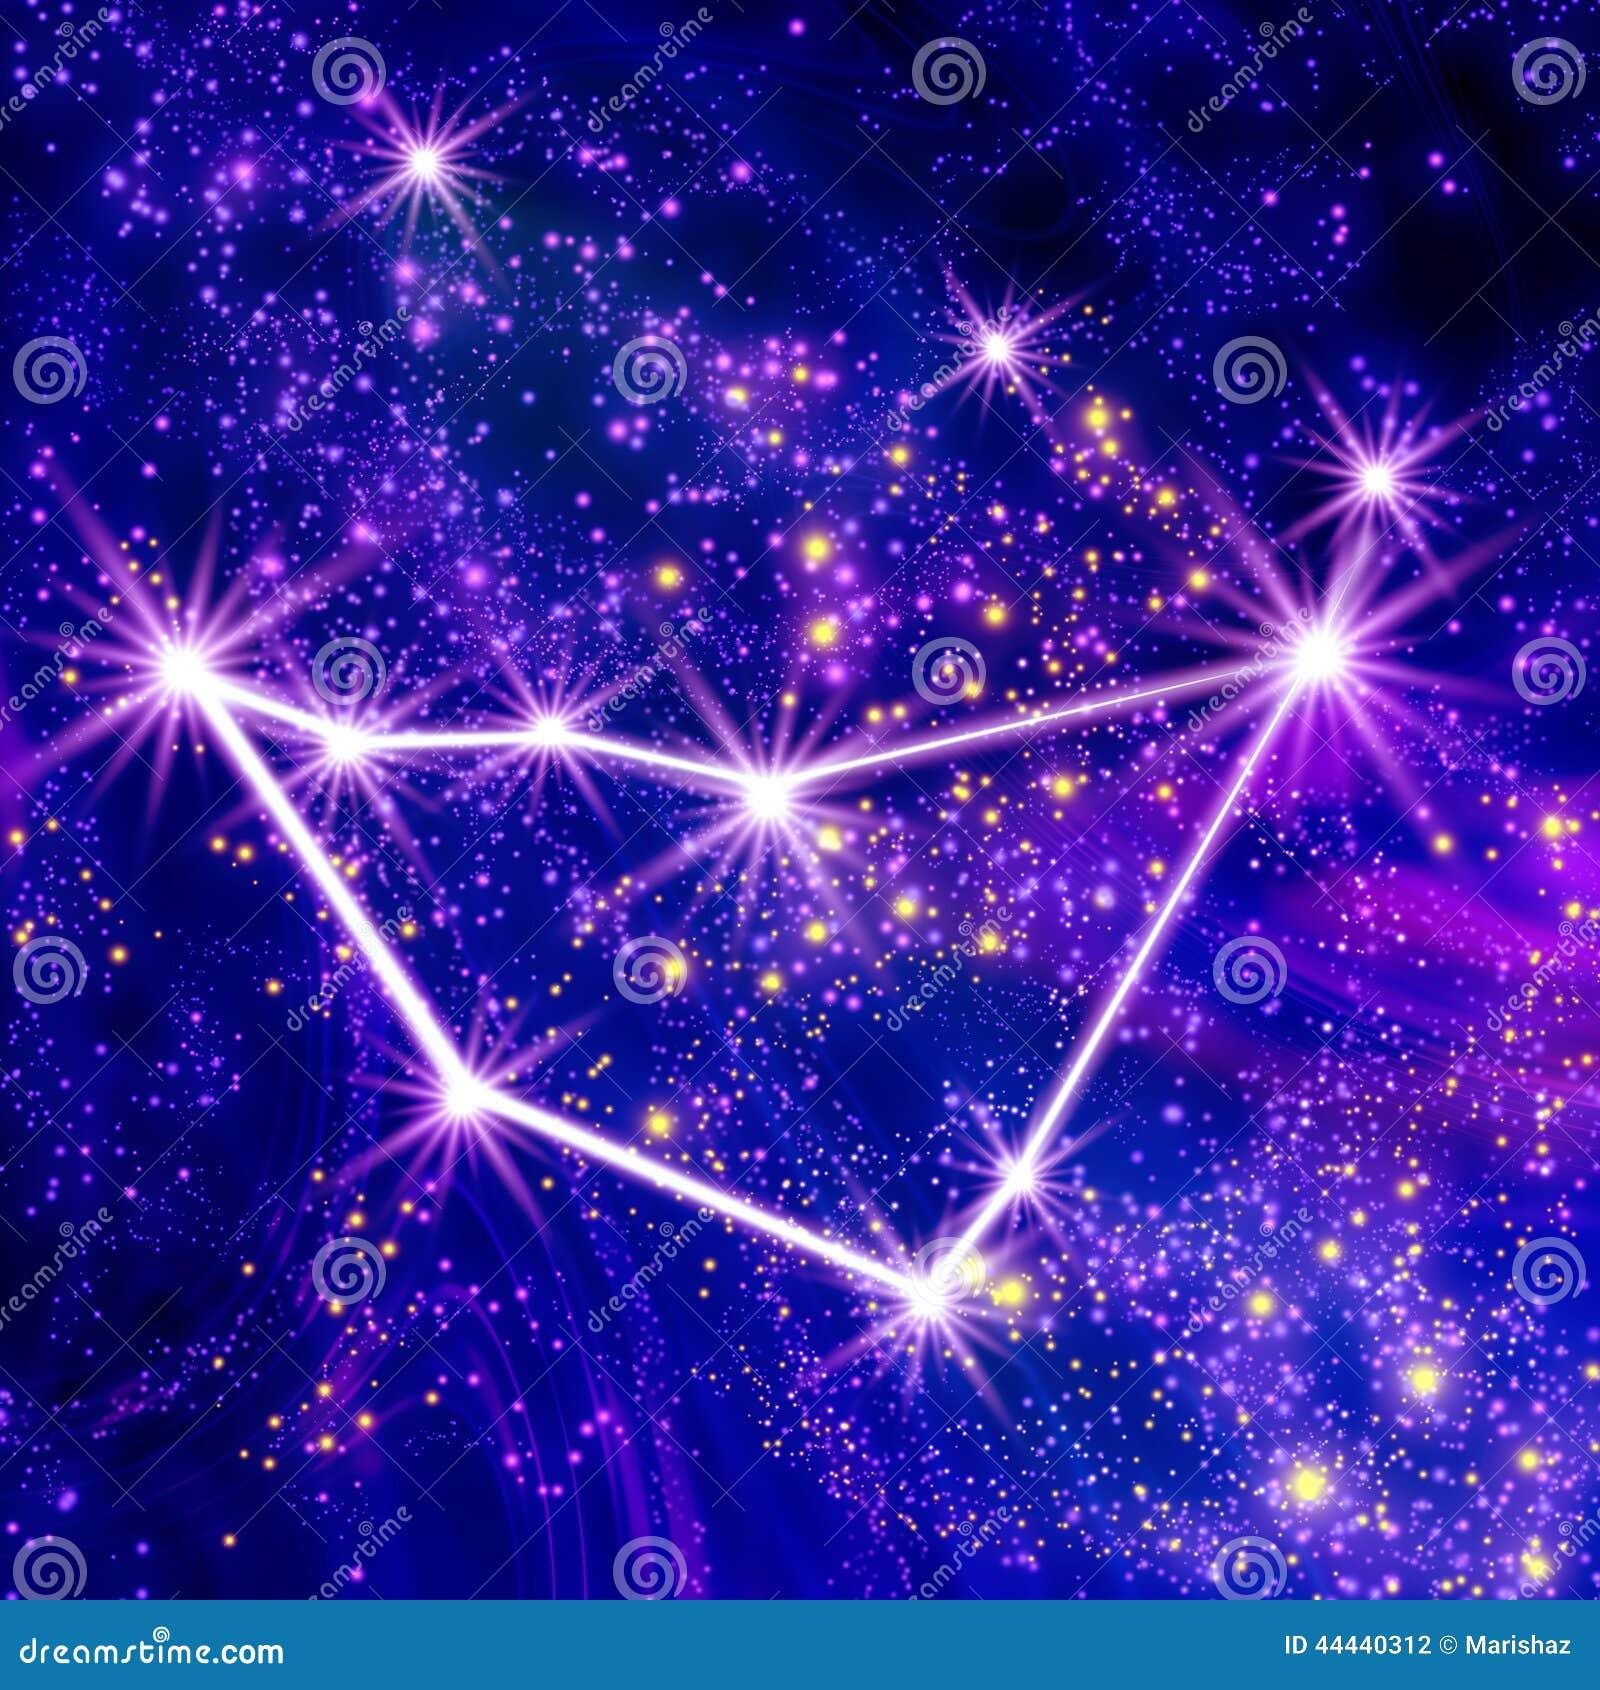 Constellation Capricorn Stock Illustration - Image: 44440312